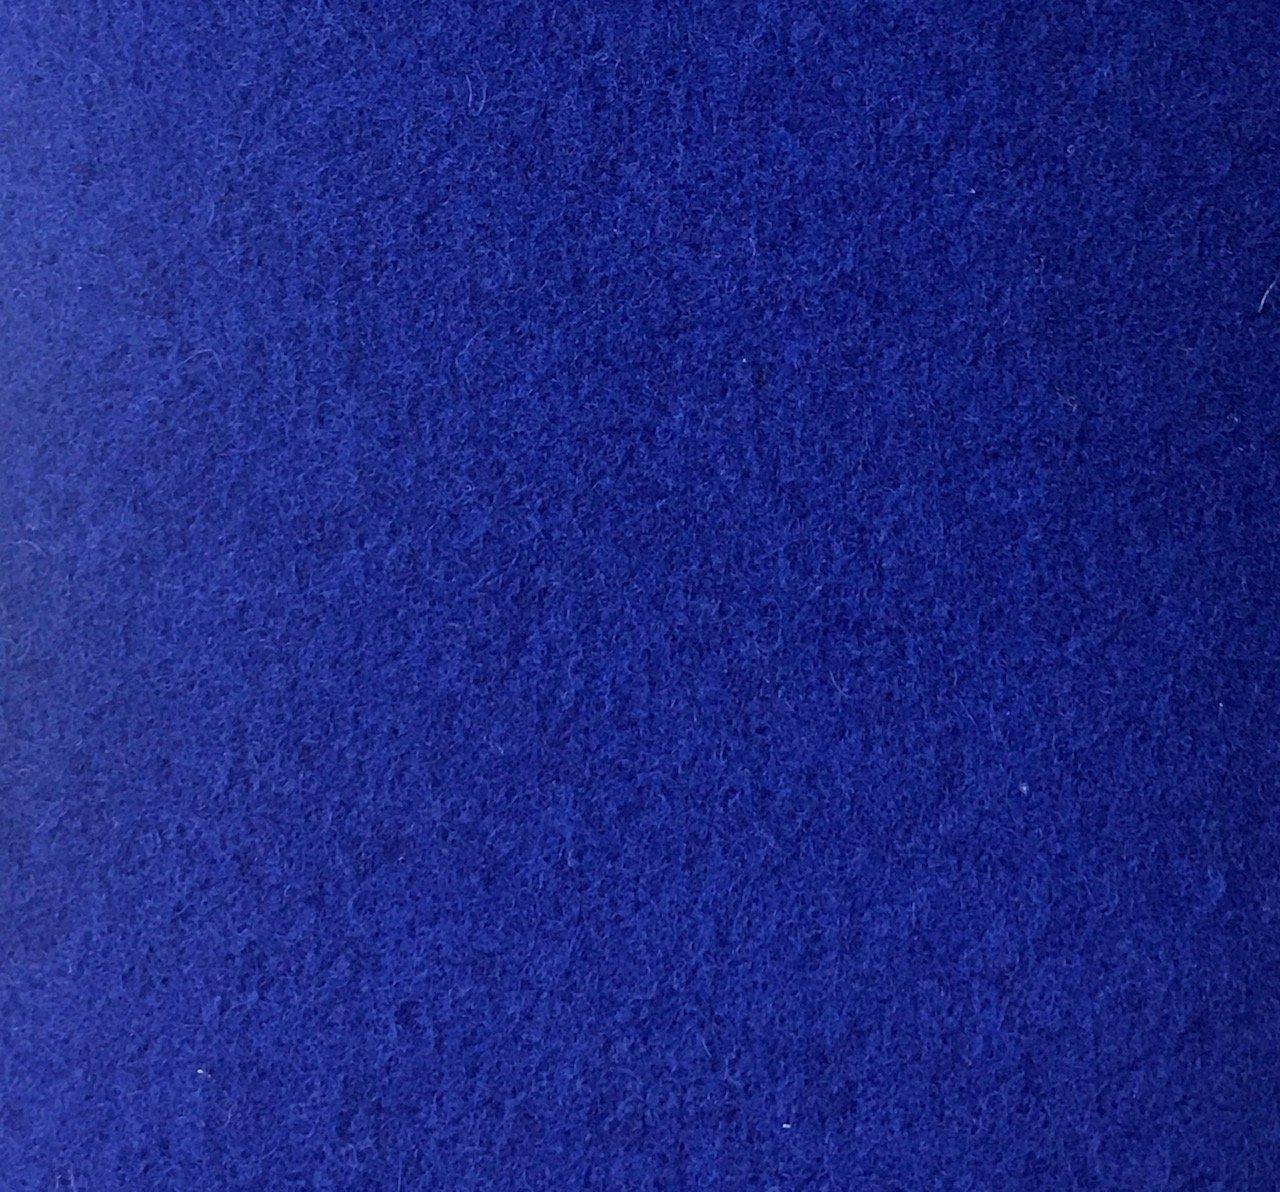 Wool Blend -  Royal Blue